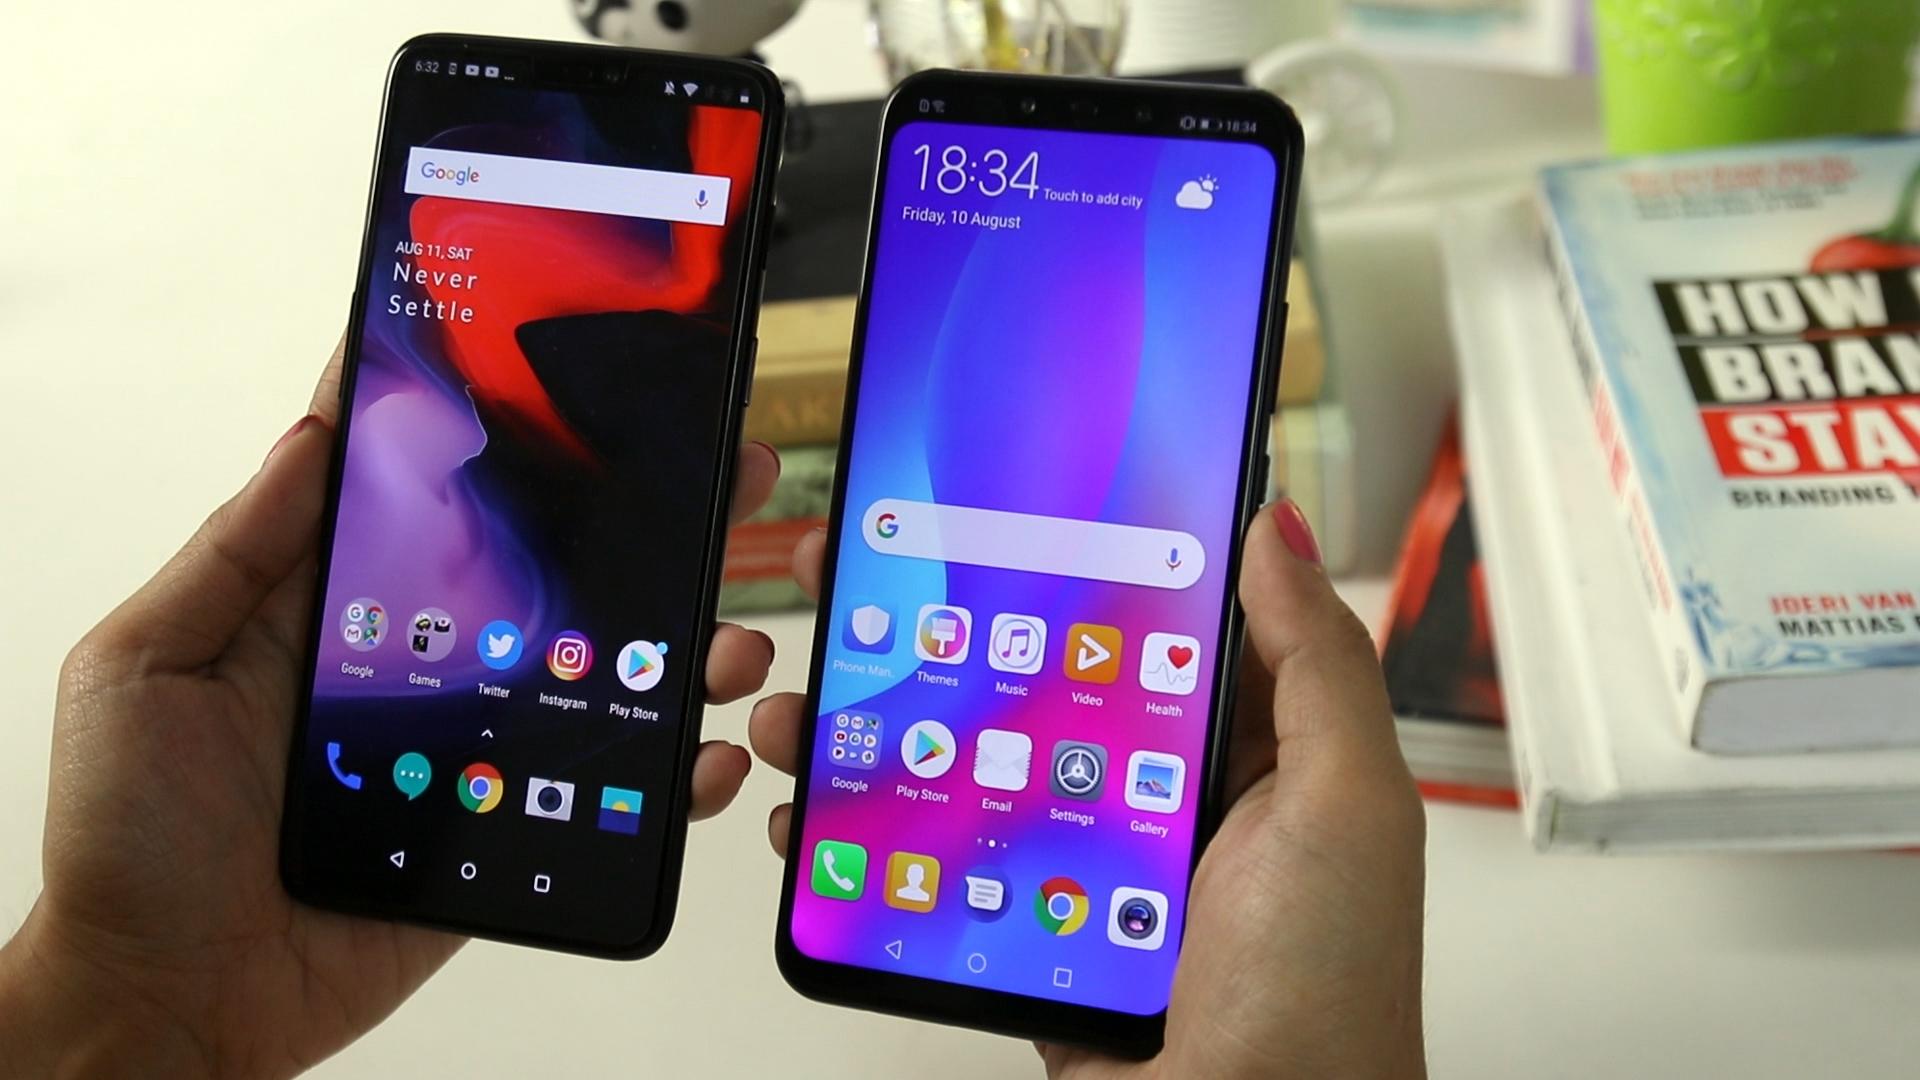 Huawei Nova 3 vs OnePlus 6 - Comparison Review